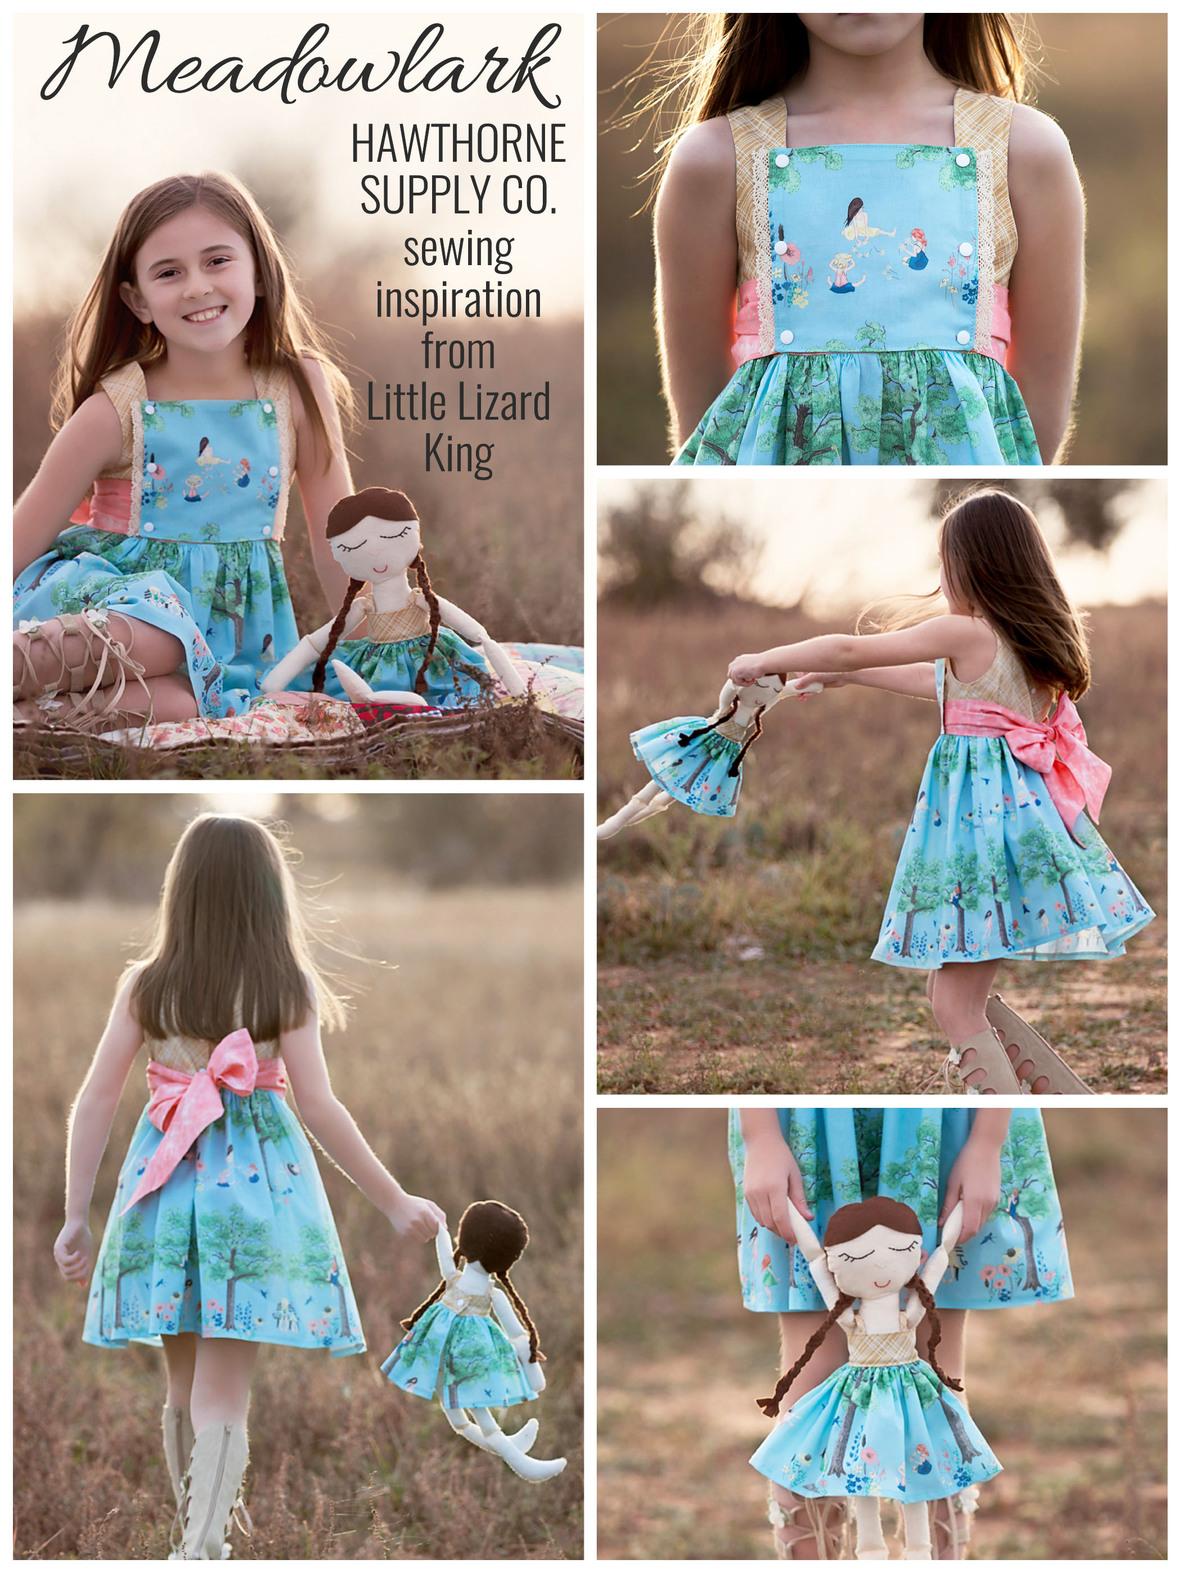 Meadowlark Fabric and Little Lizard King Dress